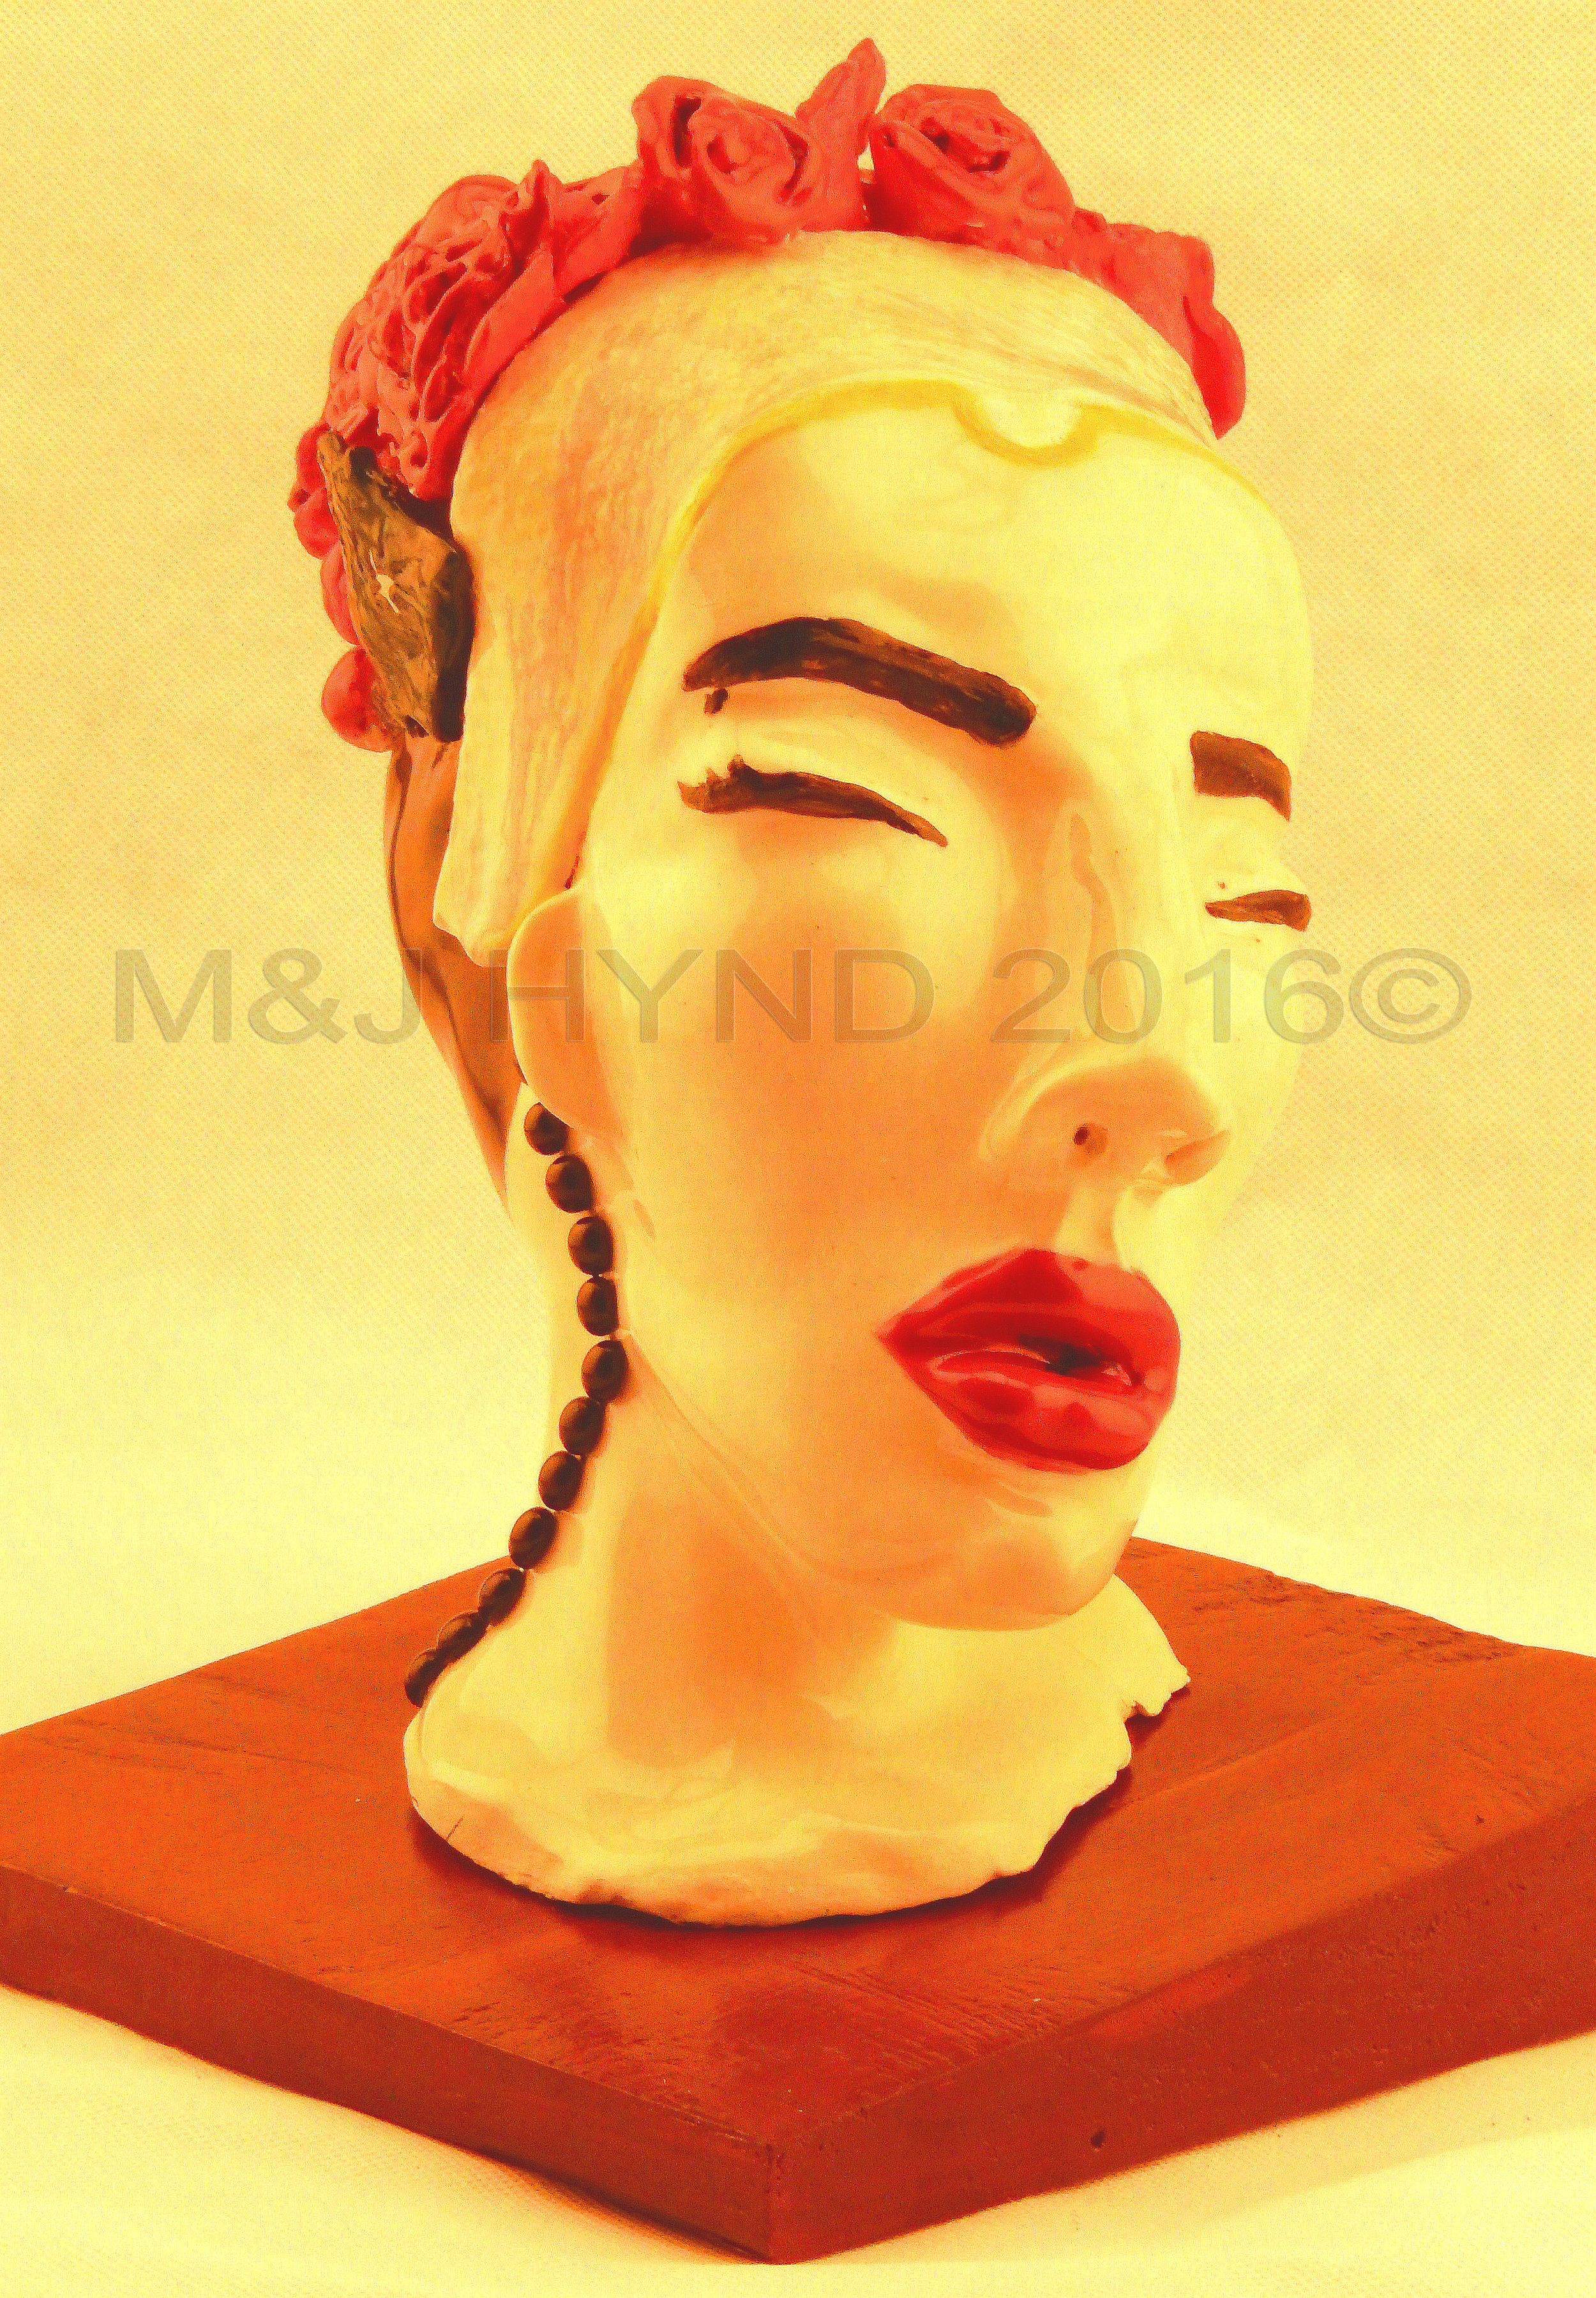 Jacqui Hynd: Ceramic bust